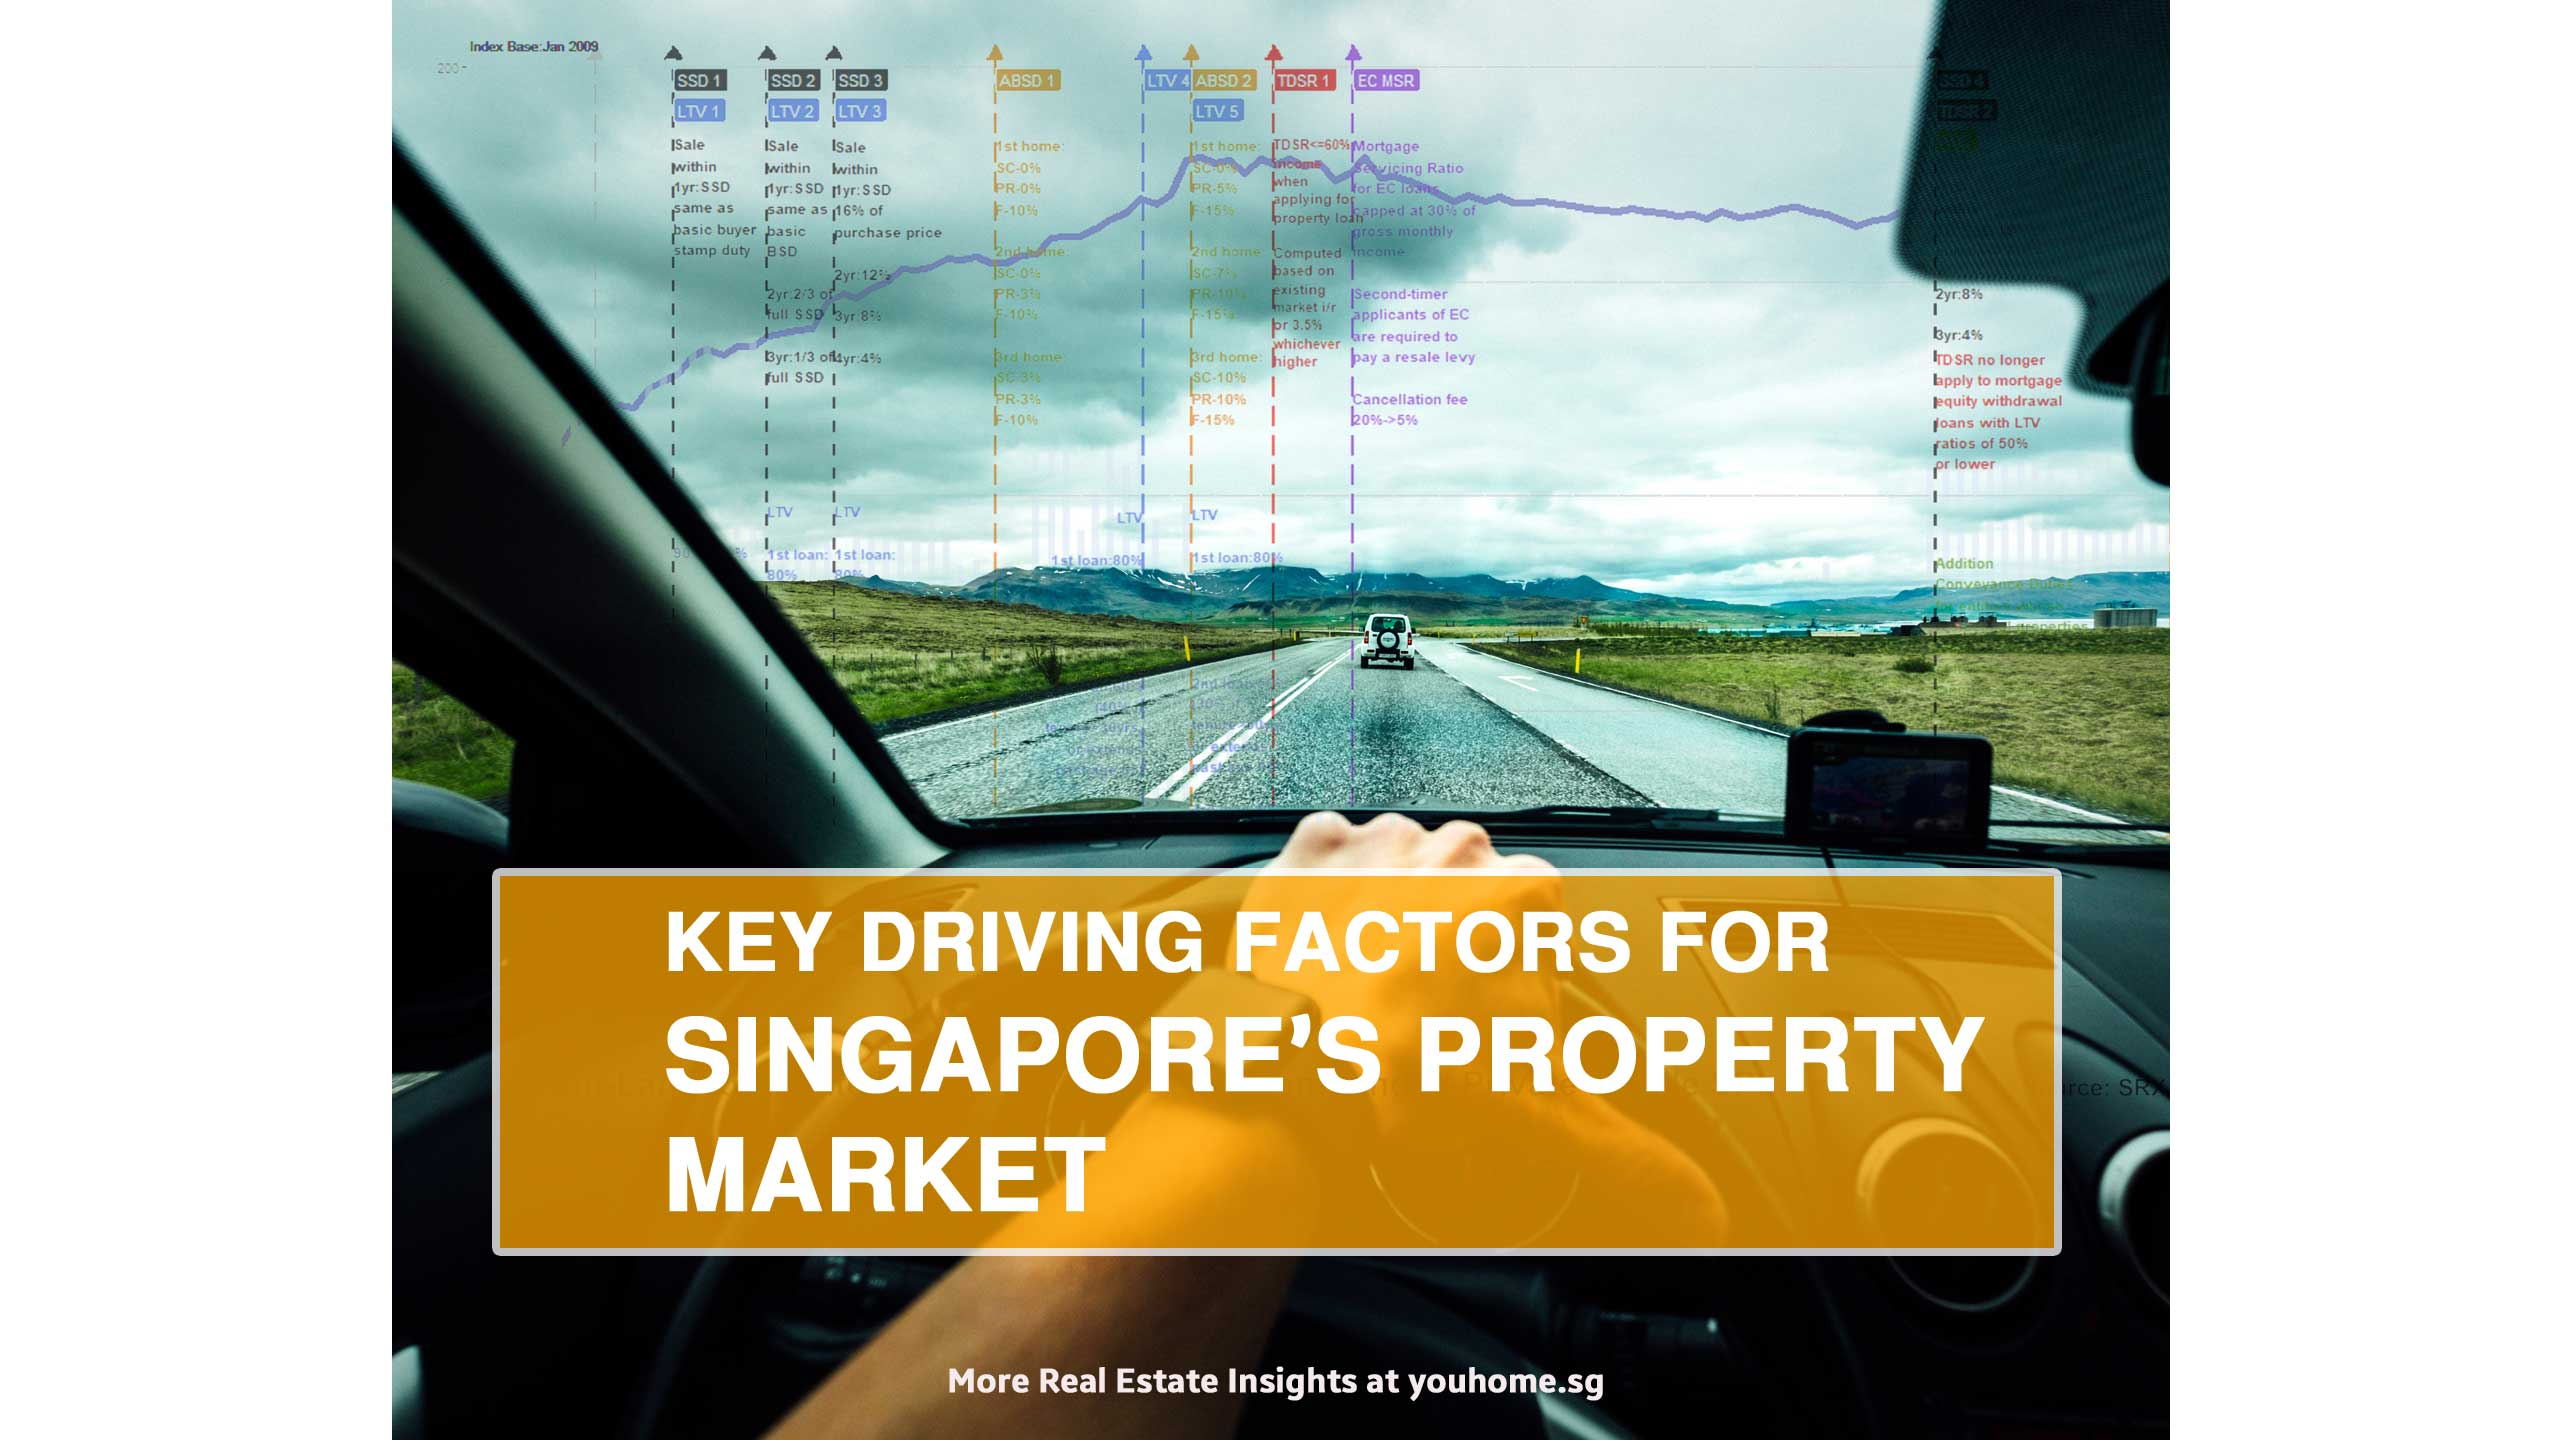 Key-Driving-Factors-for-Singapore's-Property-Market